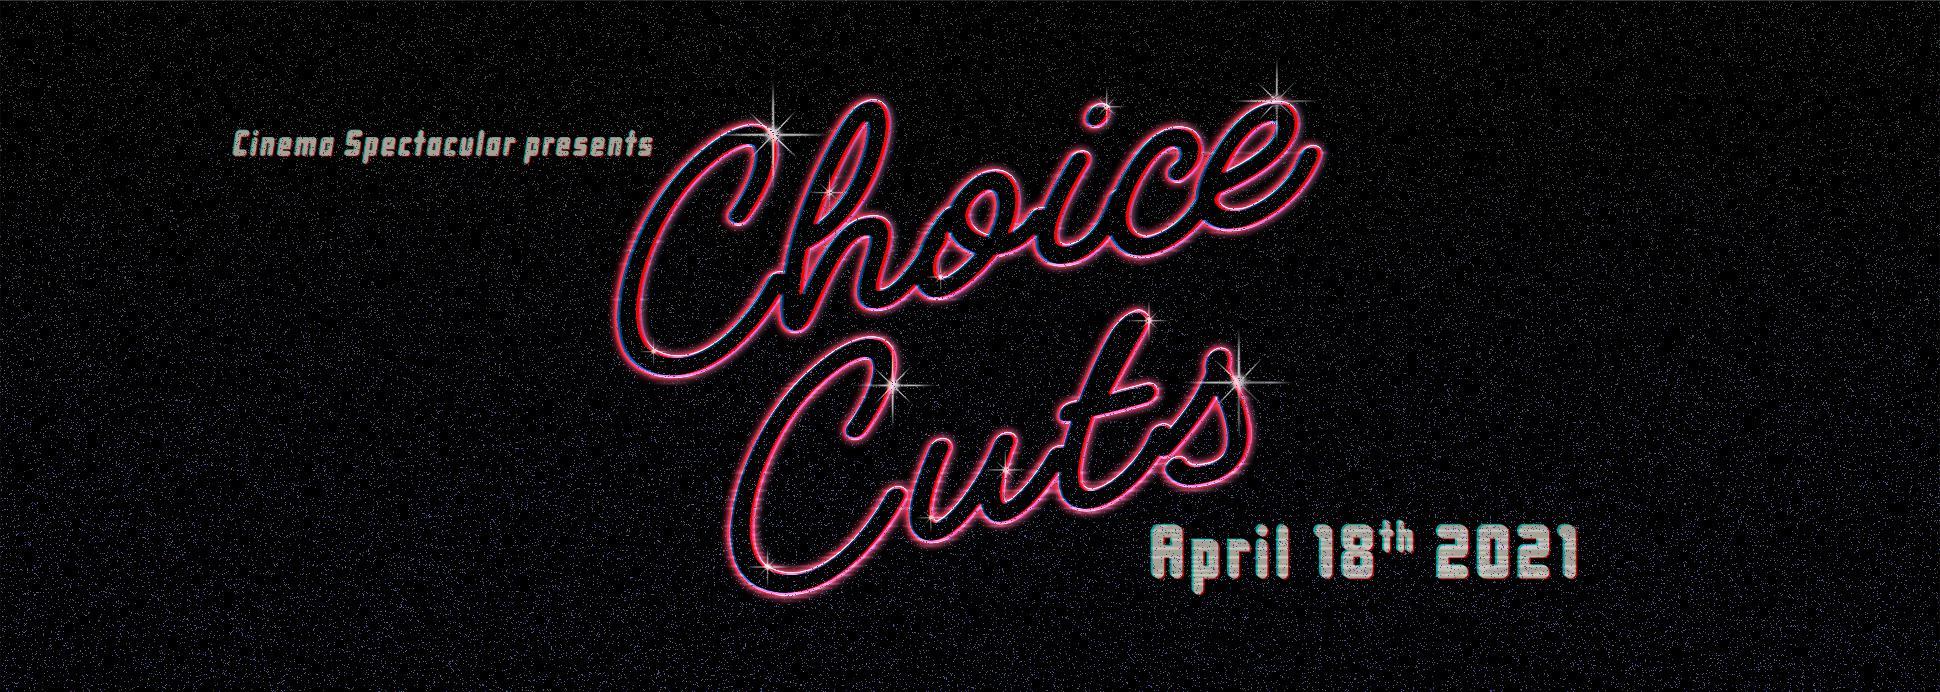 Cinema Spectacular presents: Choice Cuts